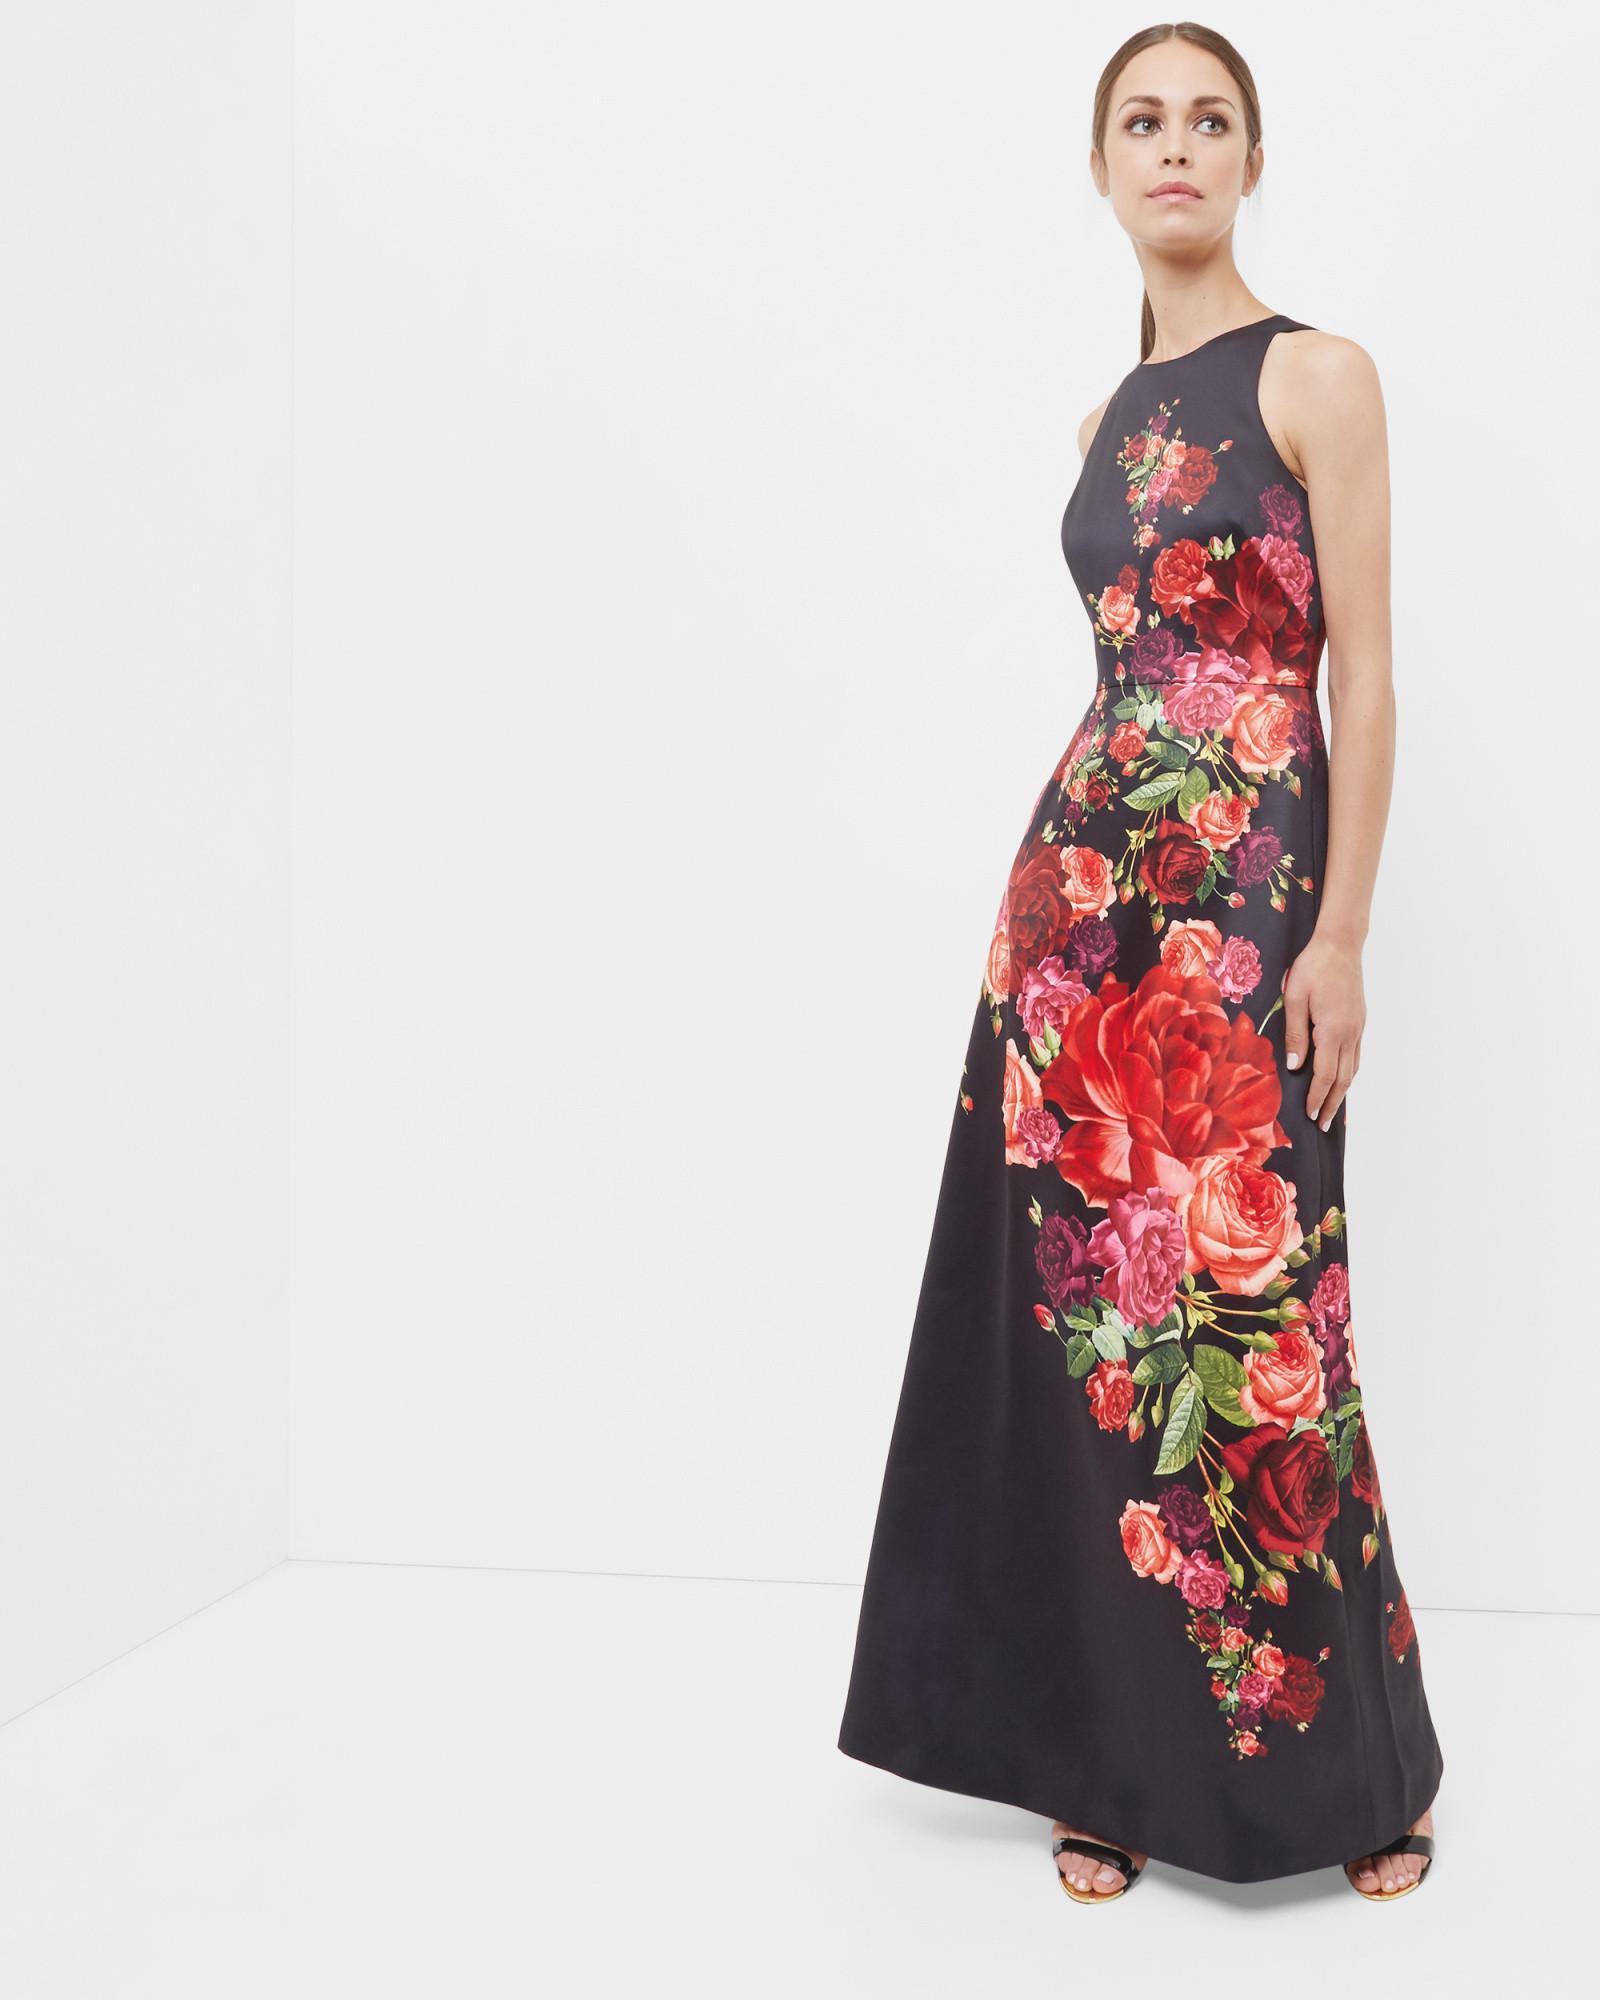 6e7e5cb80ea7c Lyst - Ted Baker Marico Juxtapose Rose Maxi Dress in Black